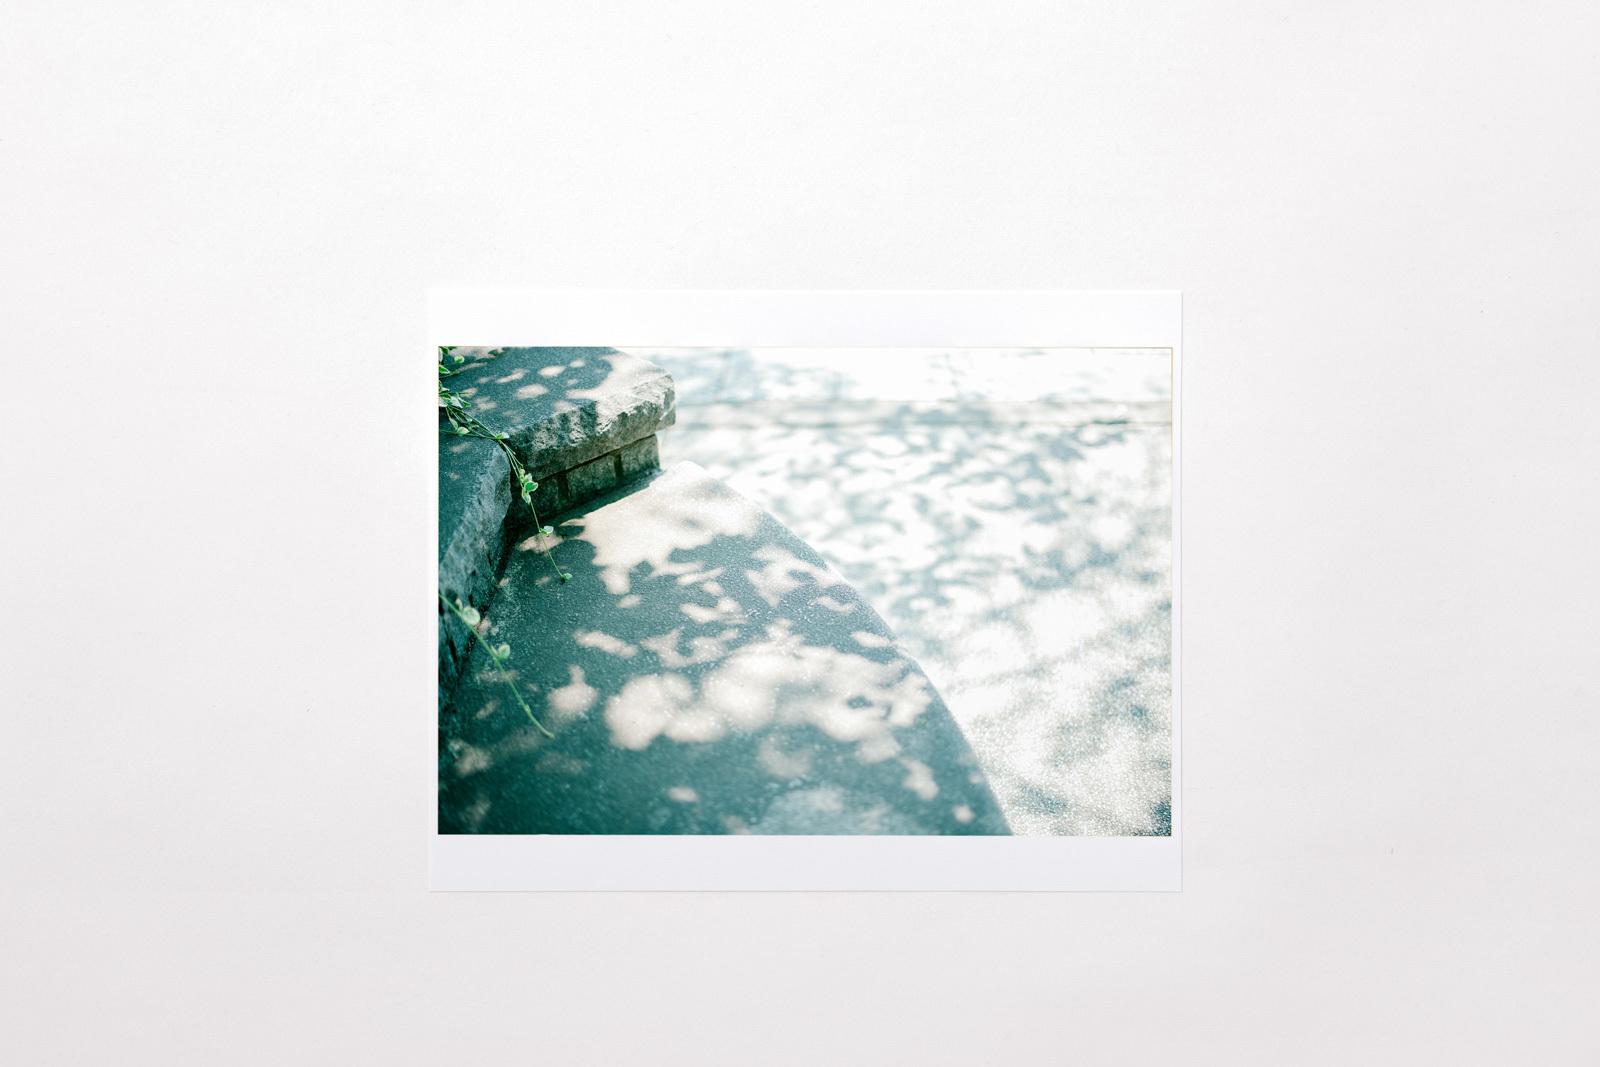 Photograph 07